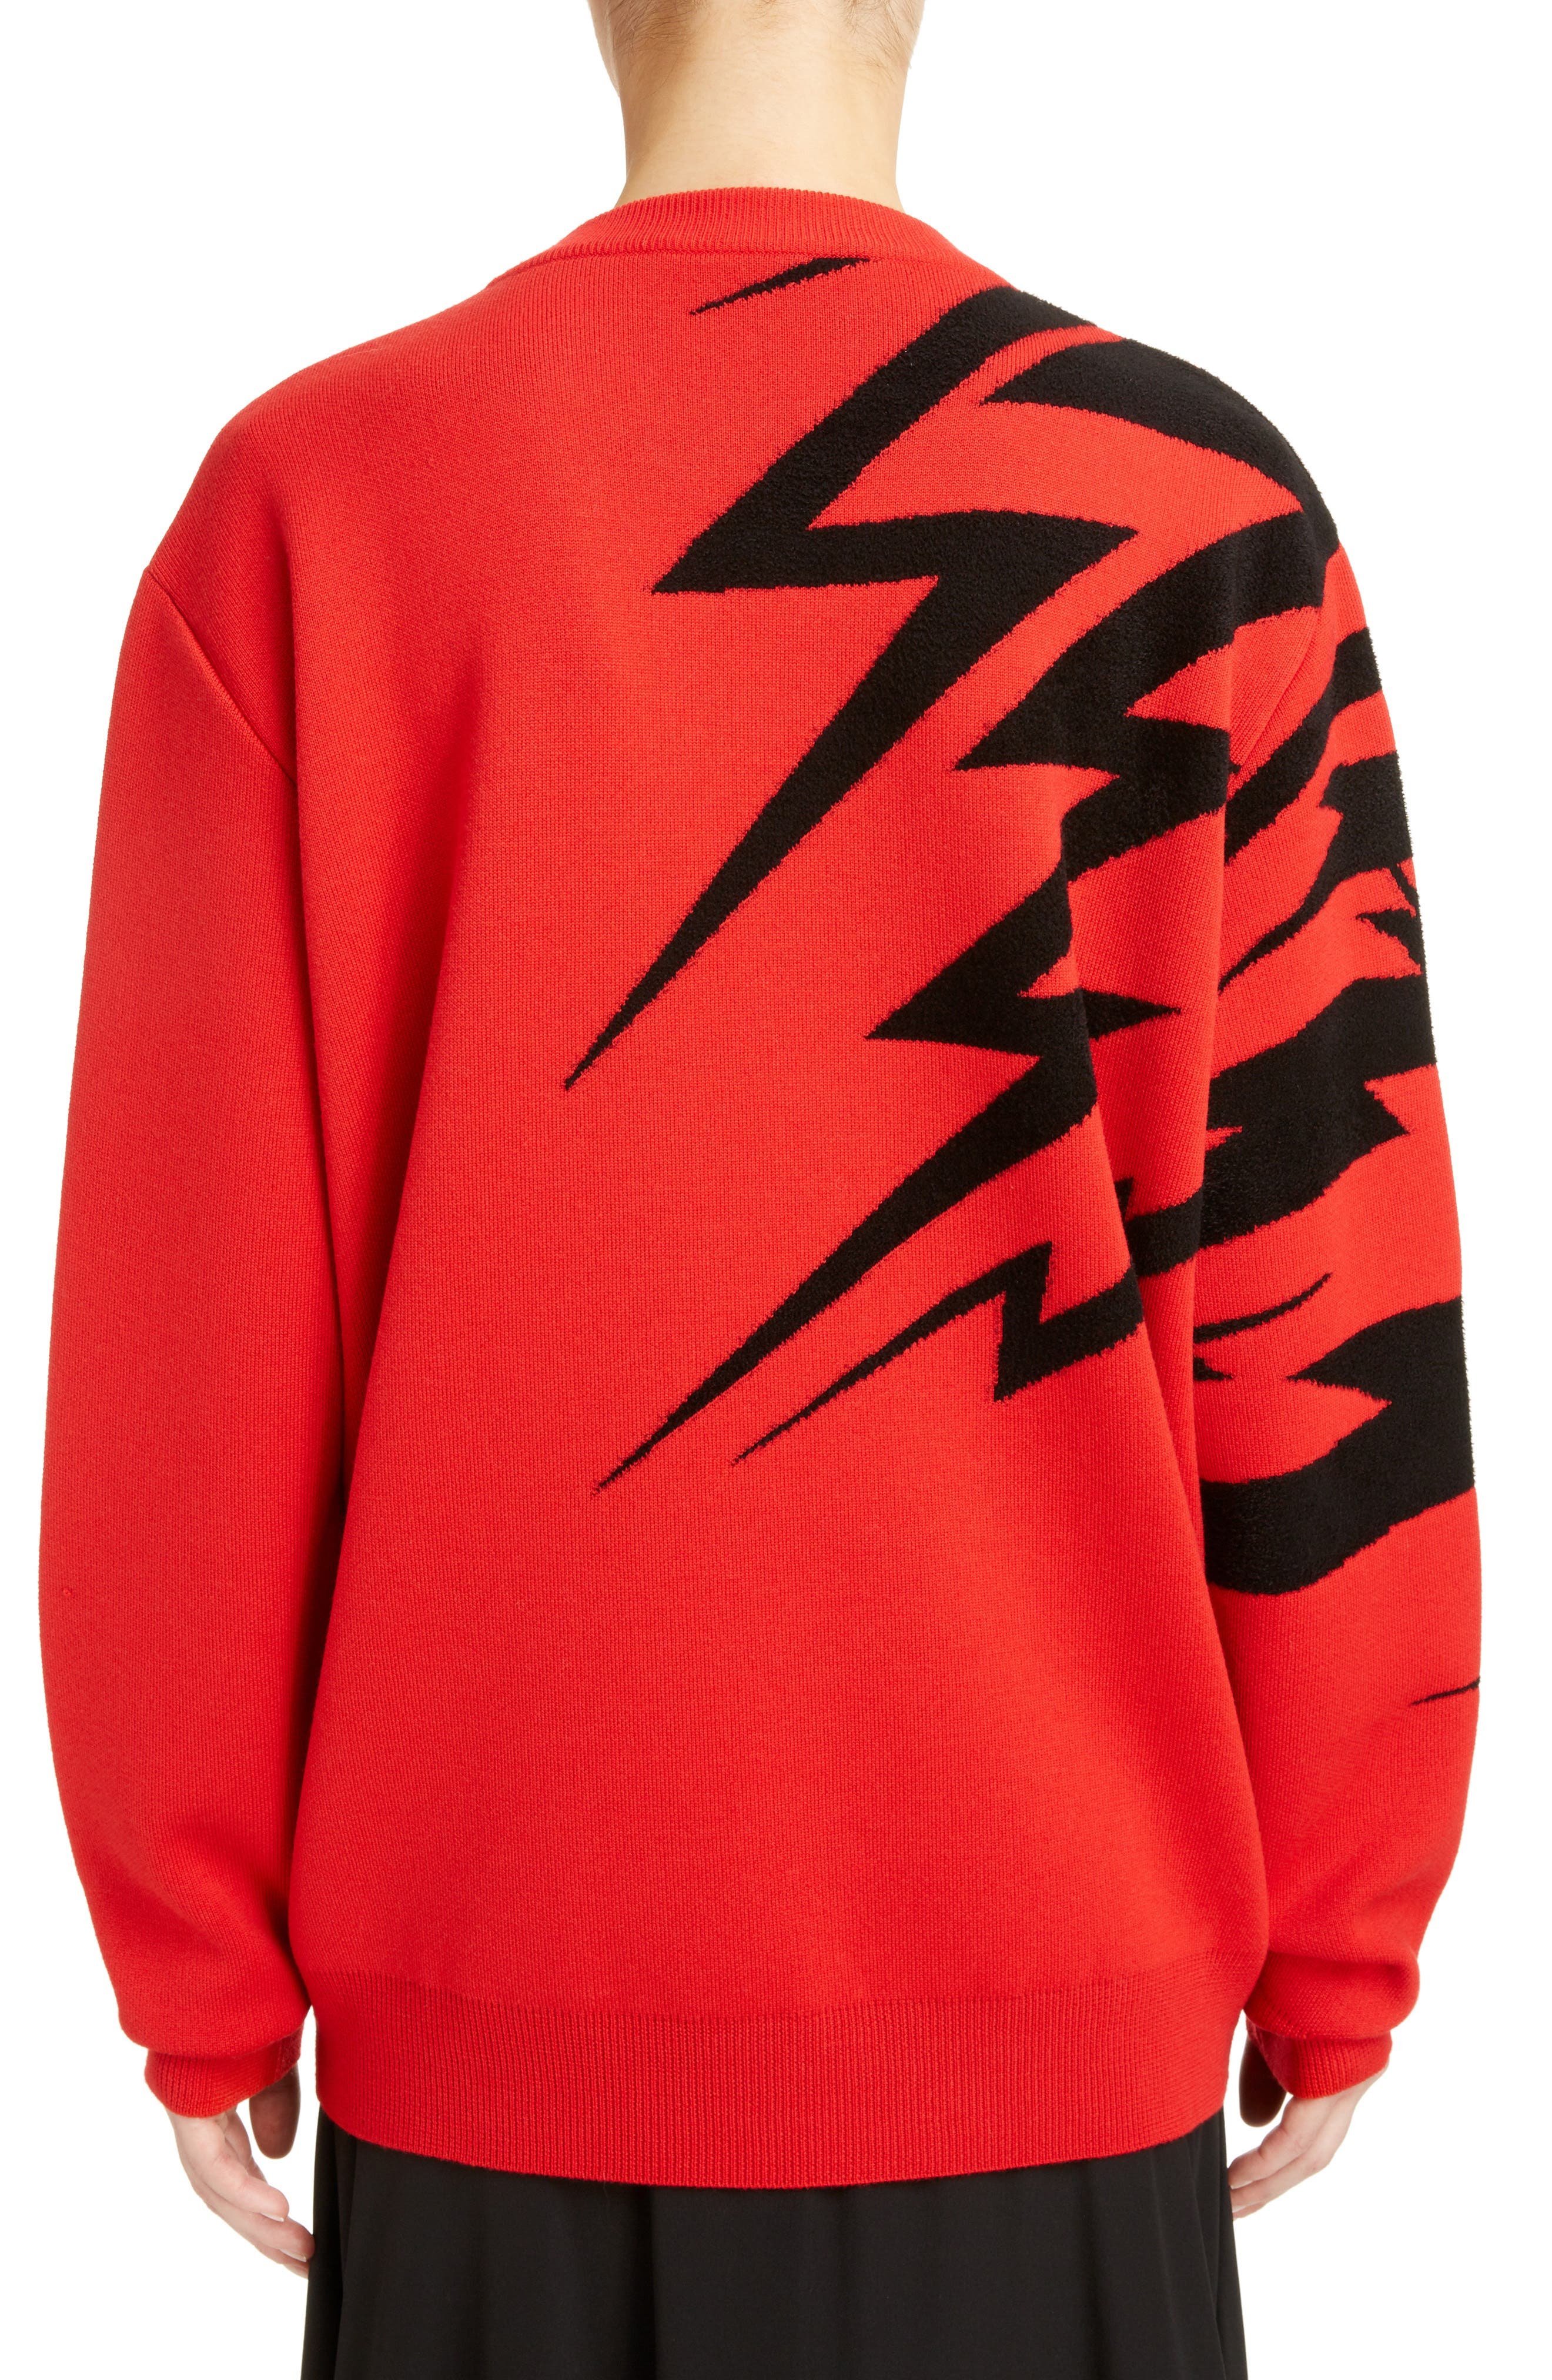 Tiger Wool Jacquard Sweater,                             Alternate thumbnail 2, color,                             RED/ BLACK